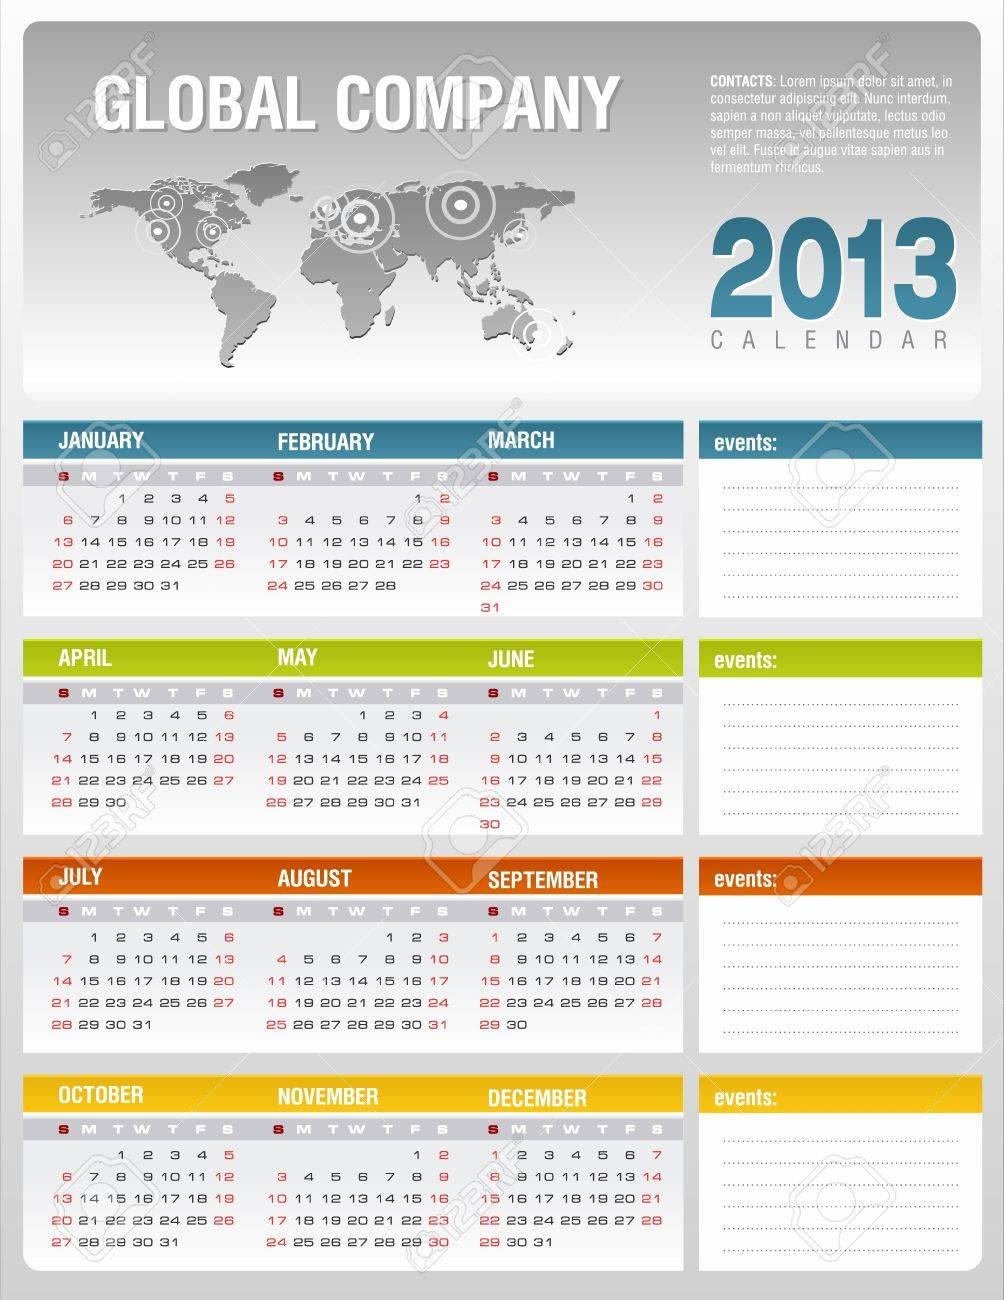 2013 Corporate Calendar Template Royalty Free Cliparts, Vectors ...